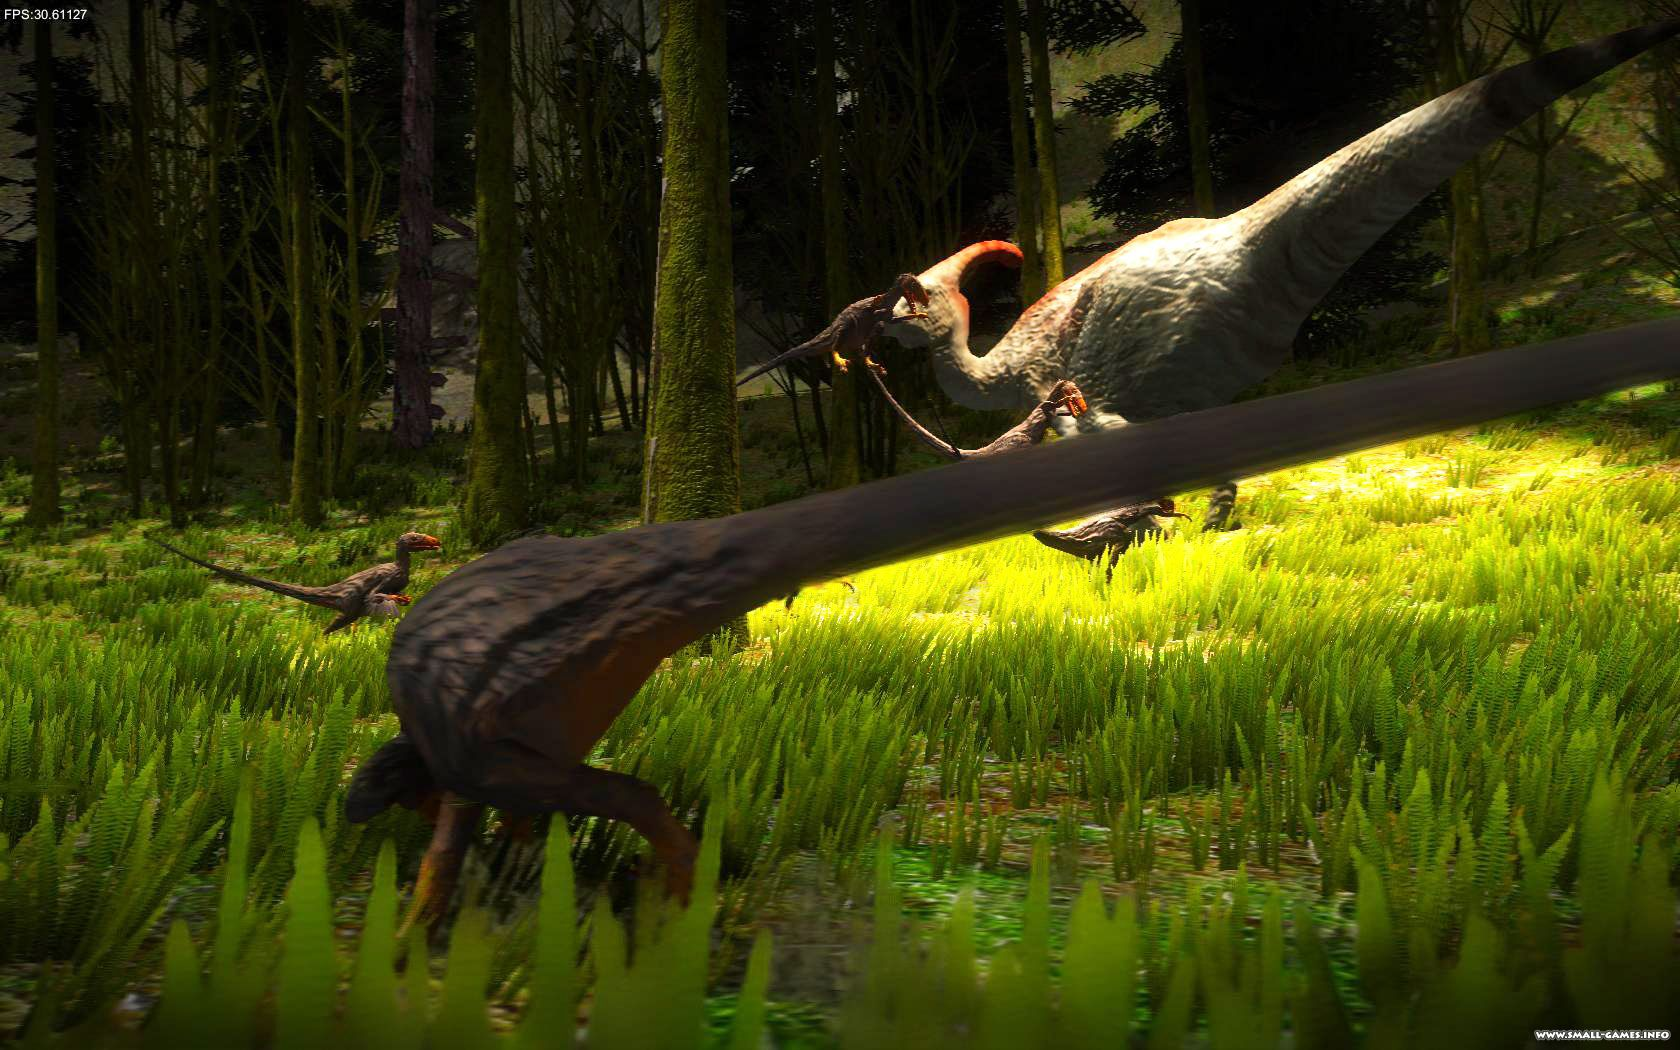 Игра thehunter primal (2015) / хантер примал охота на динозавров.